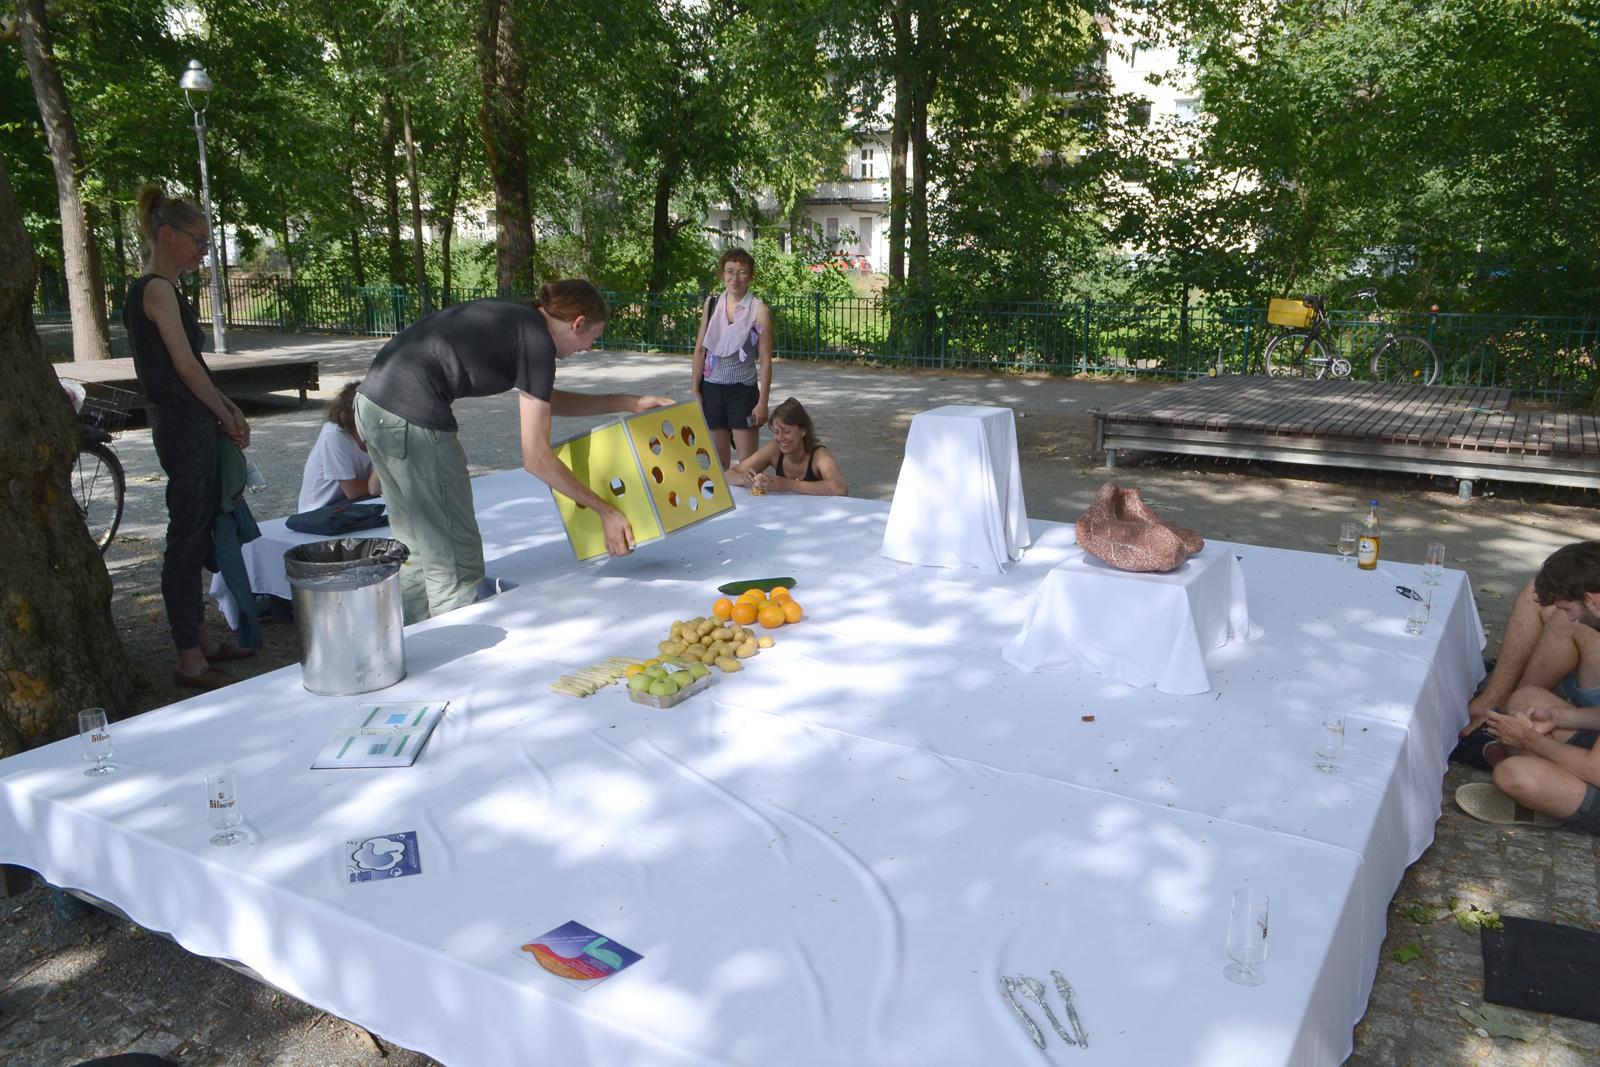 Josh Zielinski Elia Nurvista Imelda Mandala Stephan Zandt Uli Westphal stay hungry Mobile Menu #09 @ Project Space Festival Berlin 2019 Michel Aniol Meike Kuhnert